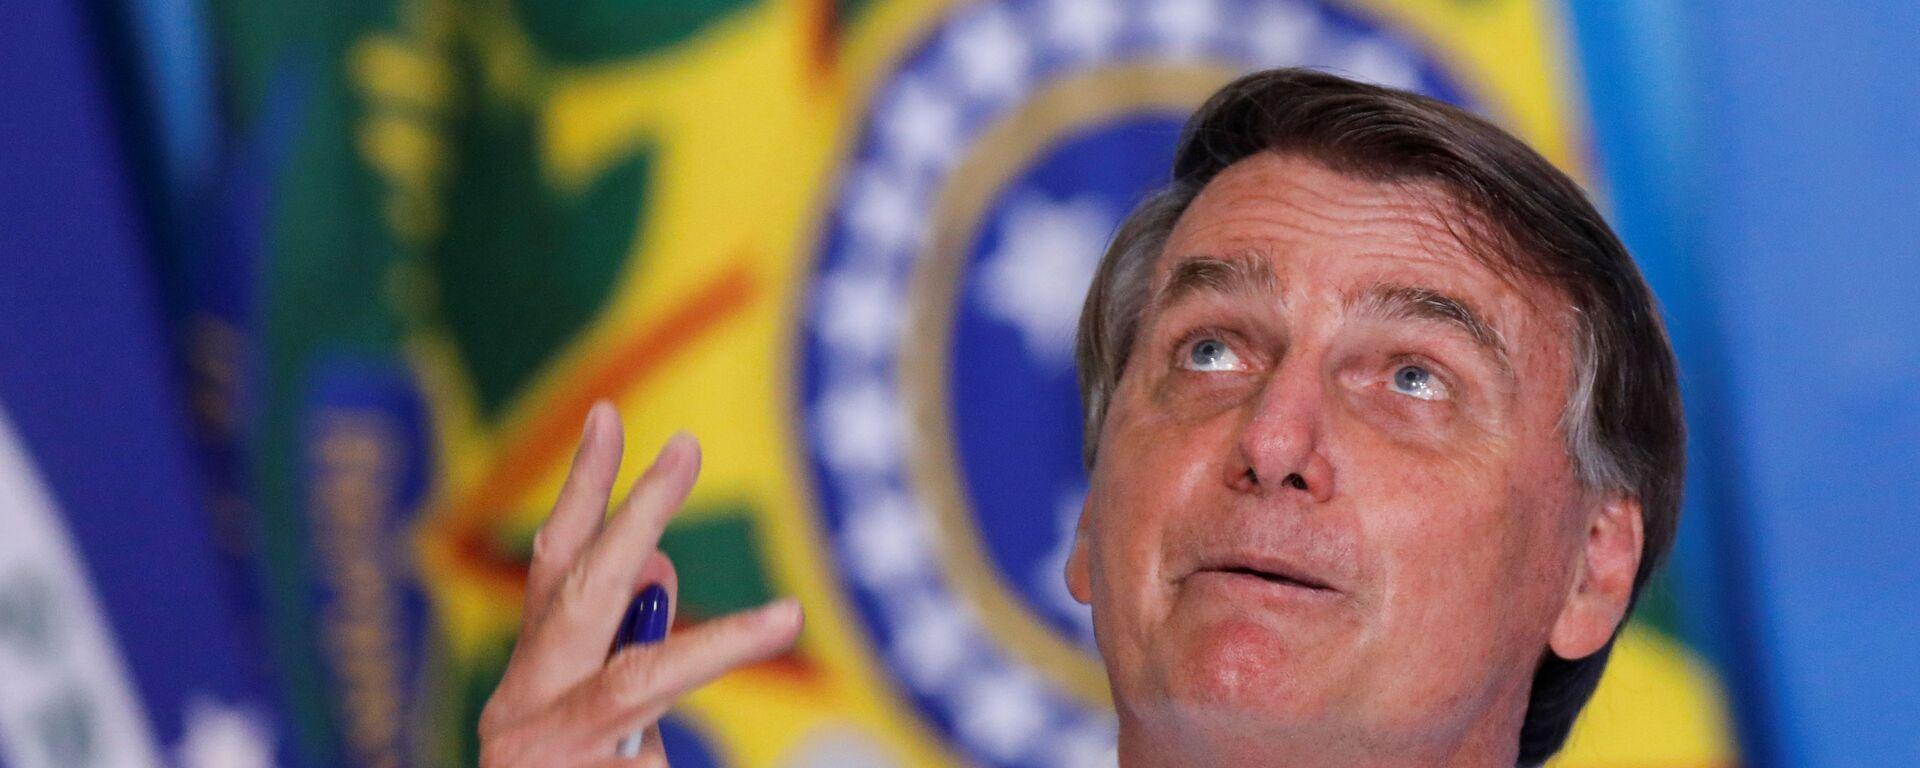 Jair Bolsonaro, presidente de Brasil - Sputnik Mundo, 1920, 26.01.2021